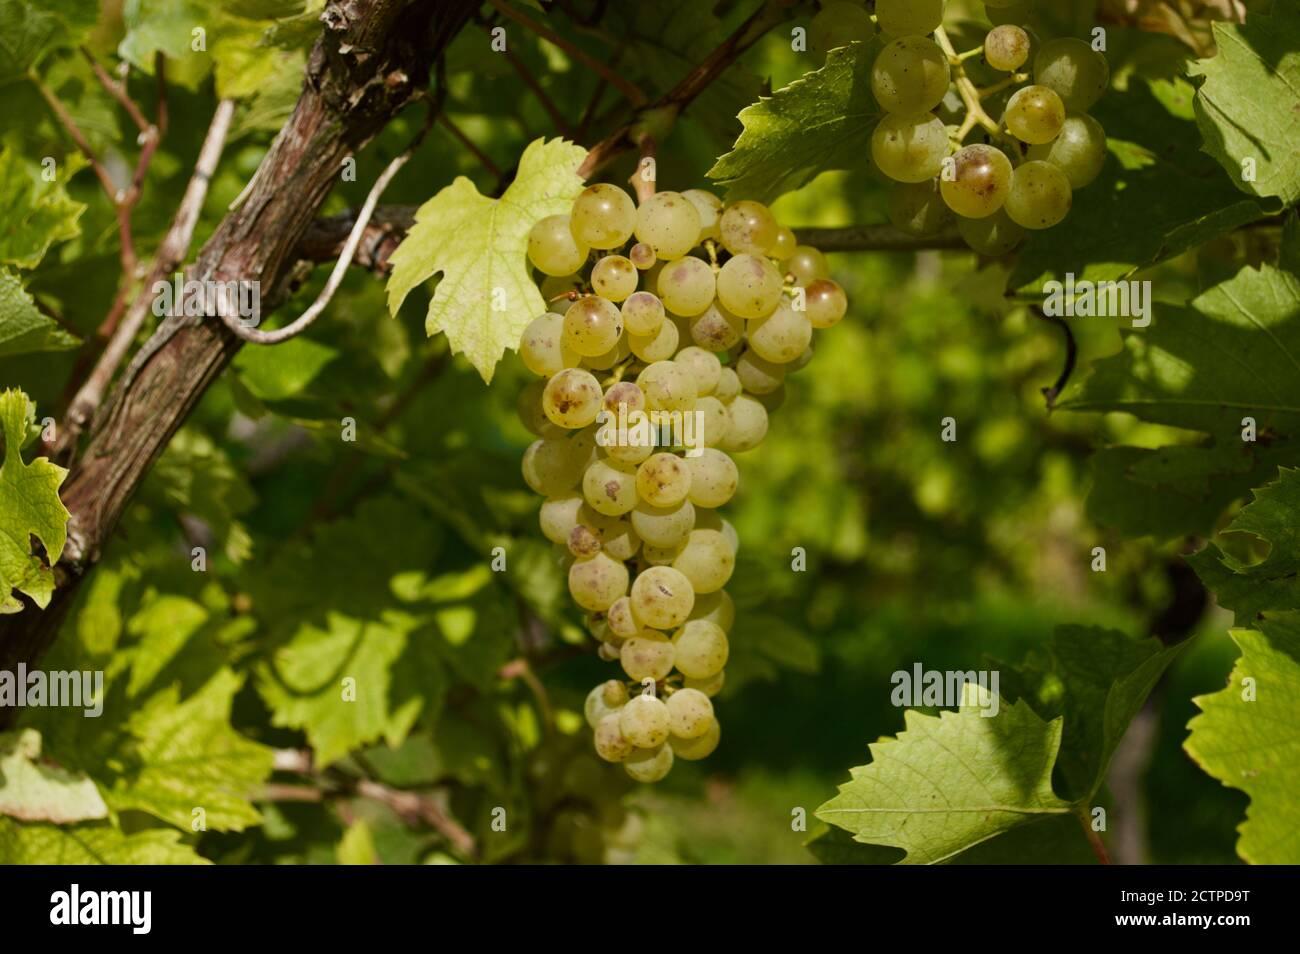 Grapevines at the Denbies Vineyard Estate in Surrey, UK Stock Photo